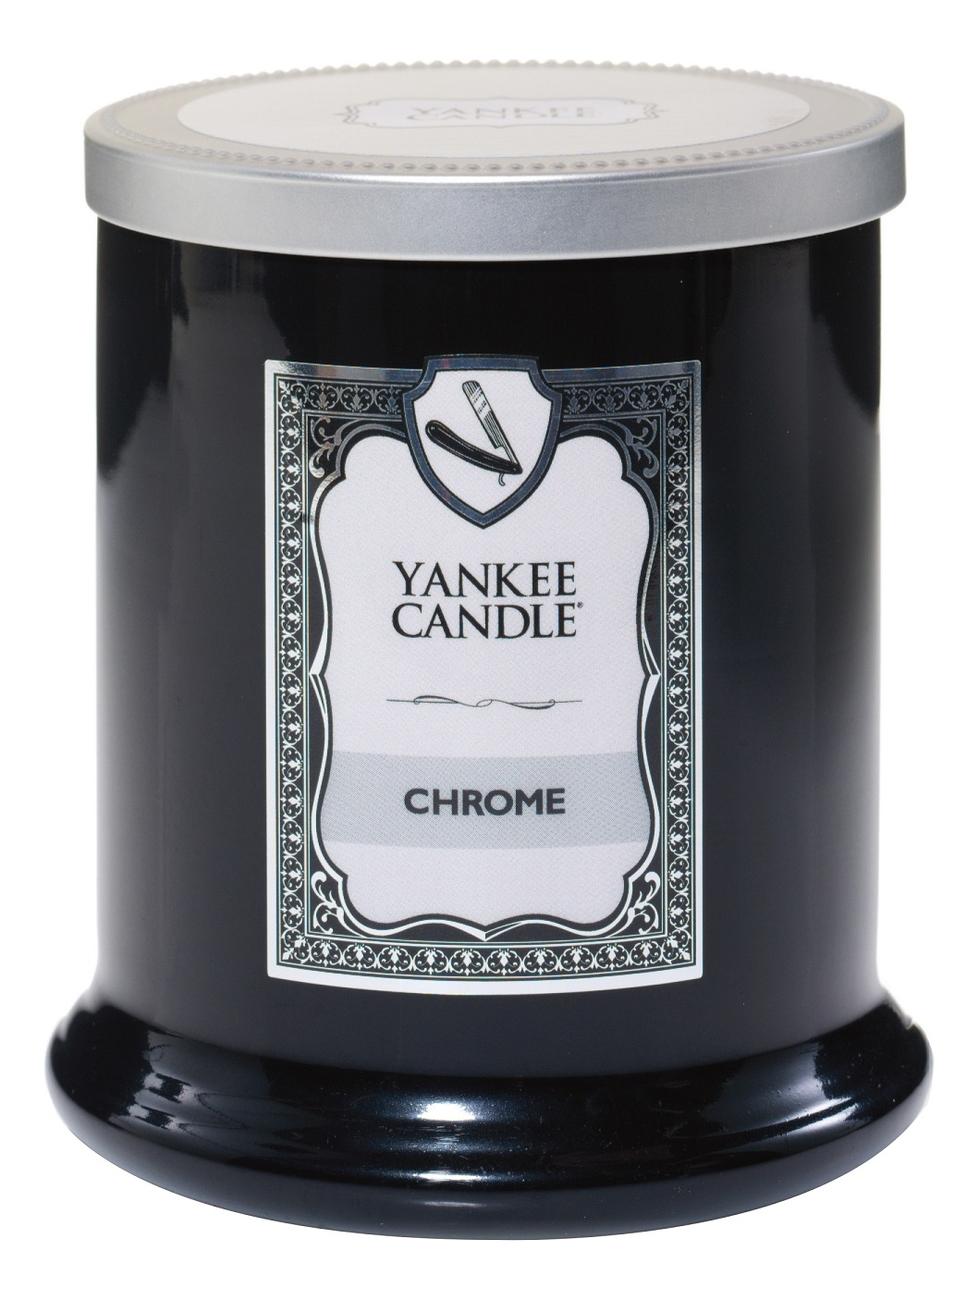 Ароматическая свеча Barbershop Chrome: Свеча 226г